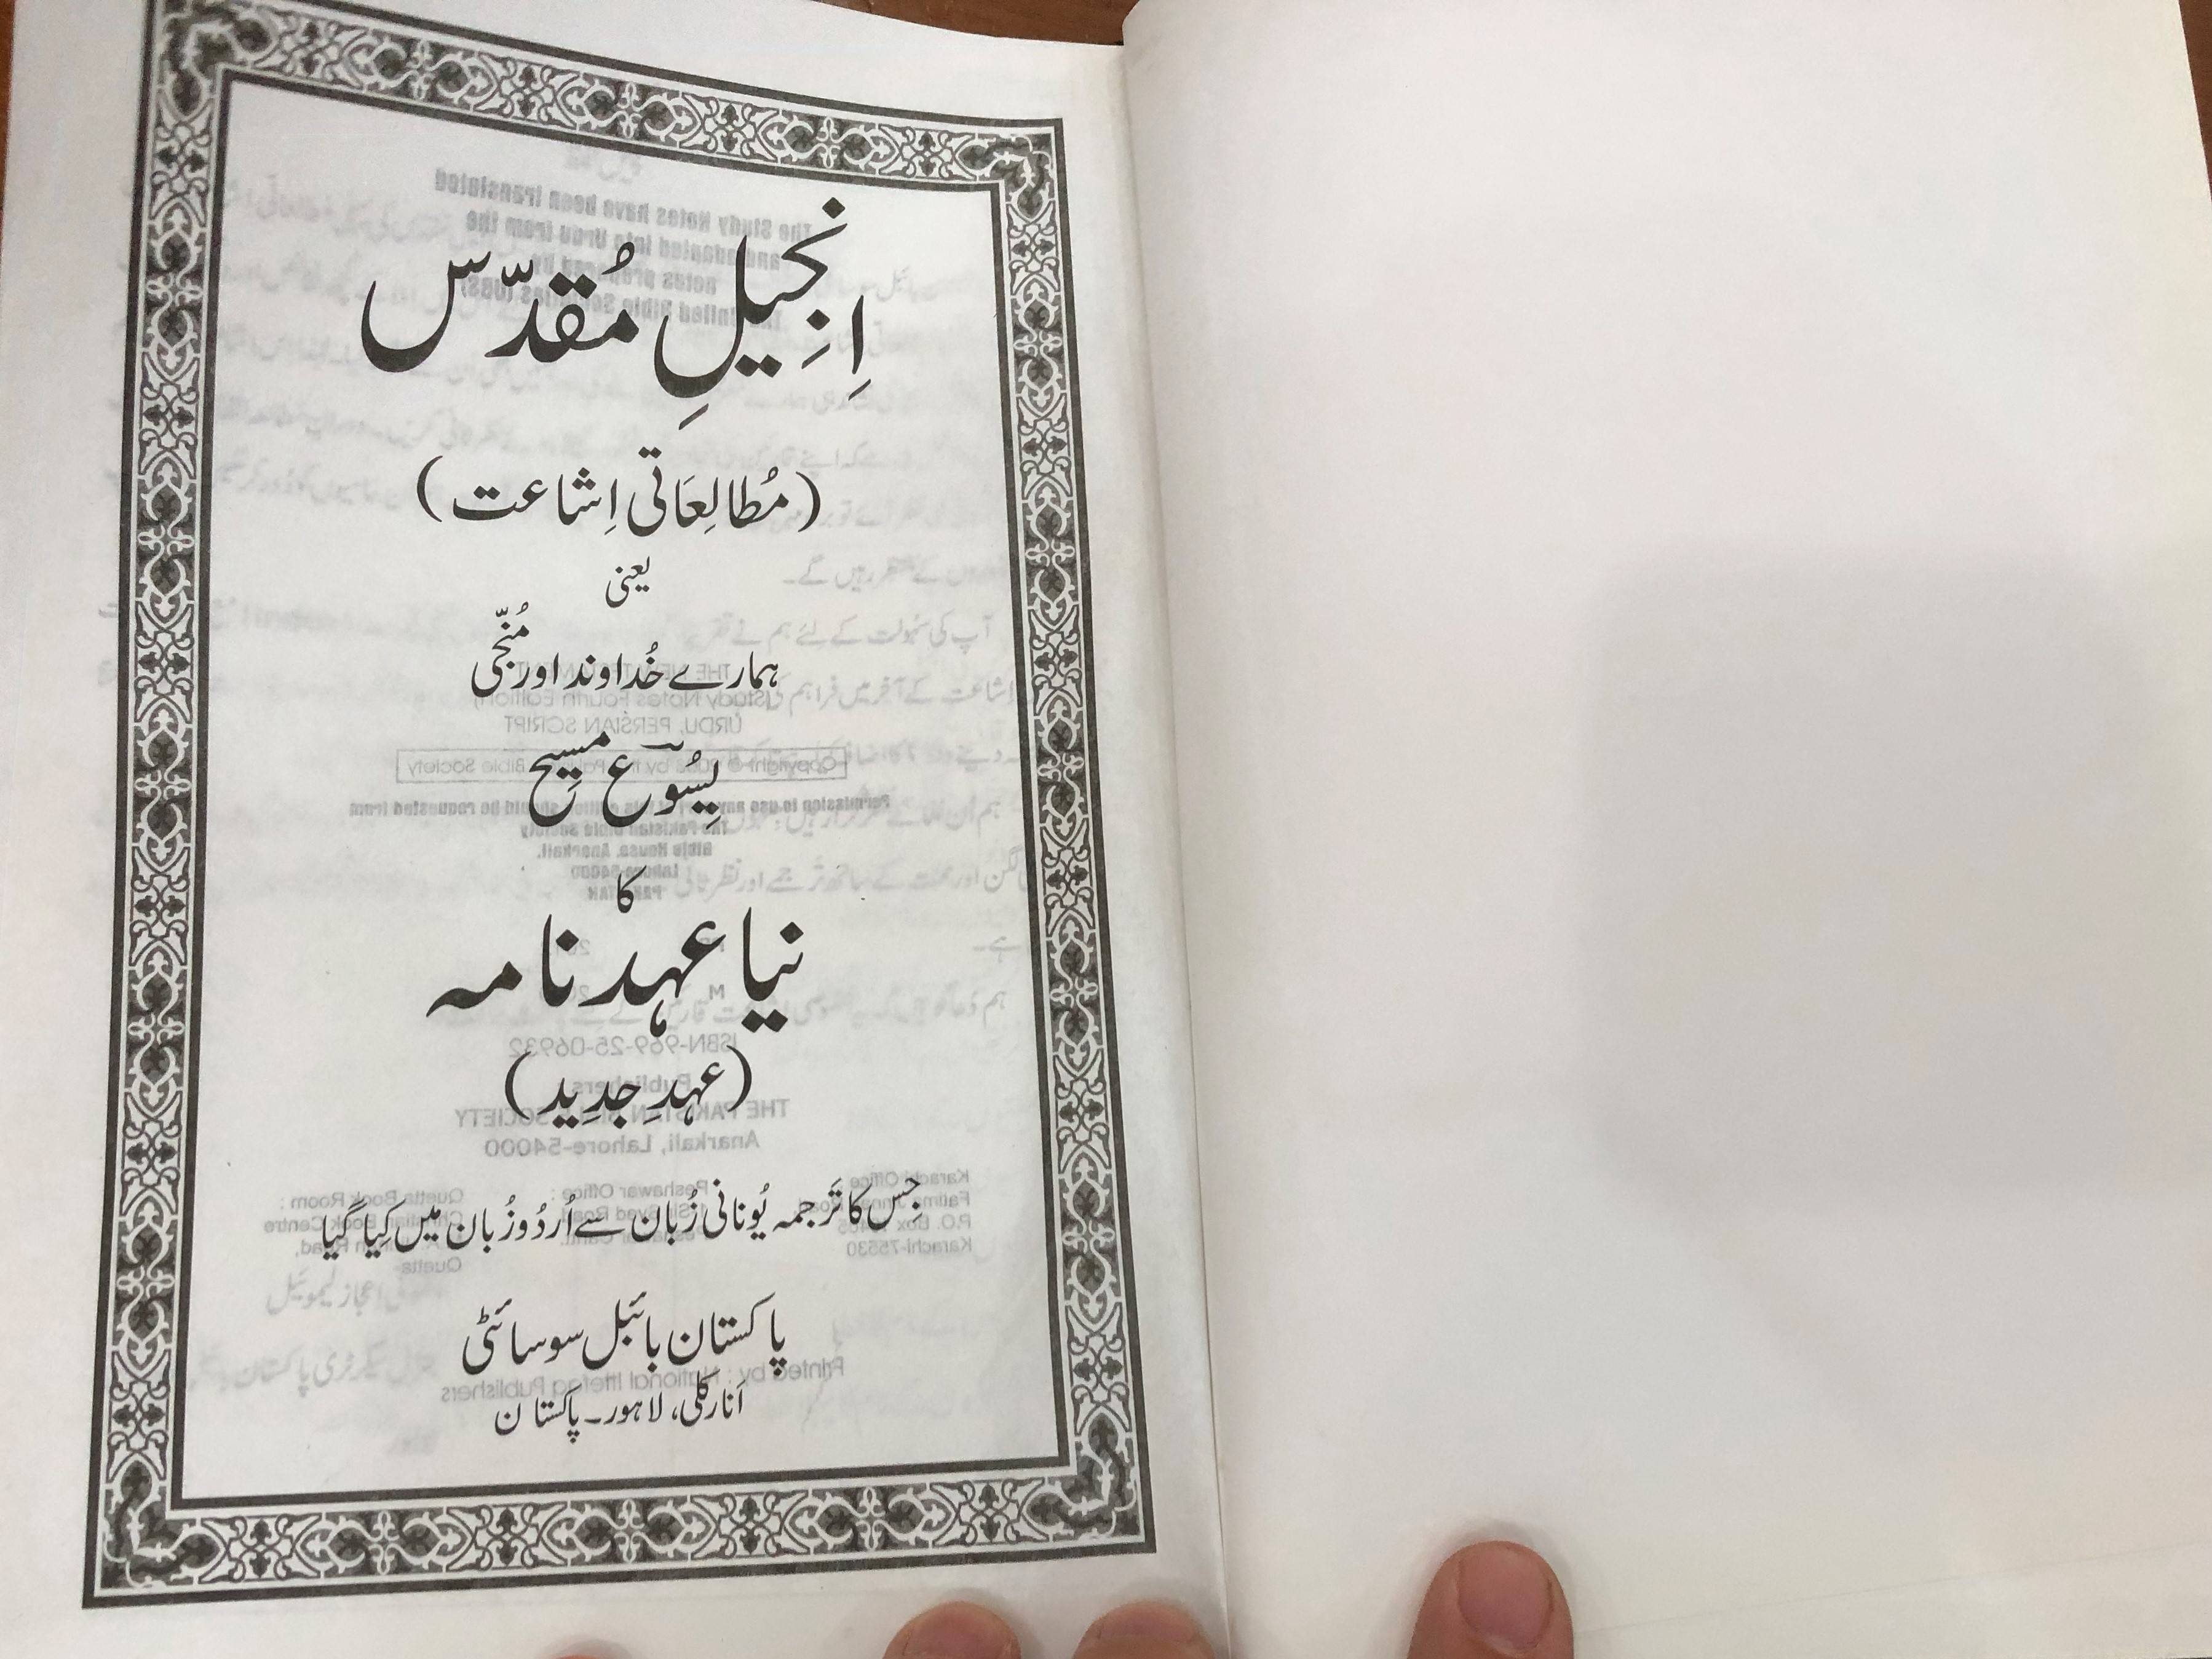 urdu-study-new-testament-2nd-edition-a-real-study-new-testament-pakistan-bible-society-2012-5-.jpg